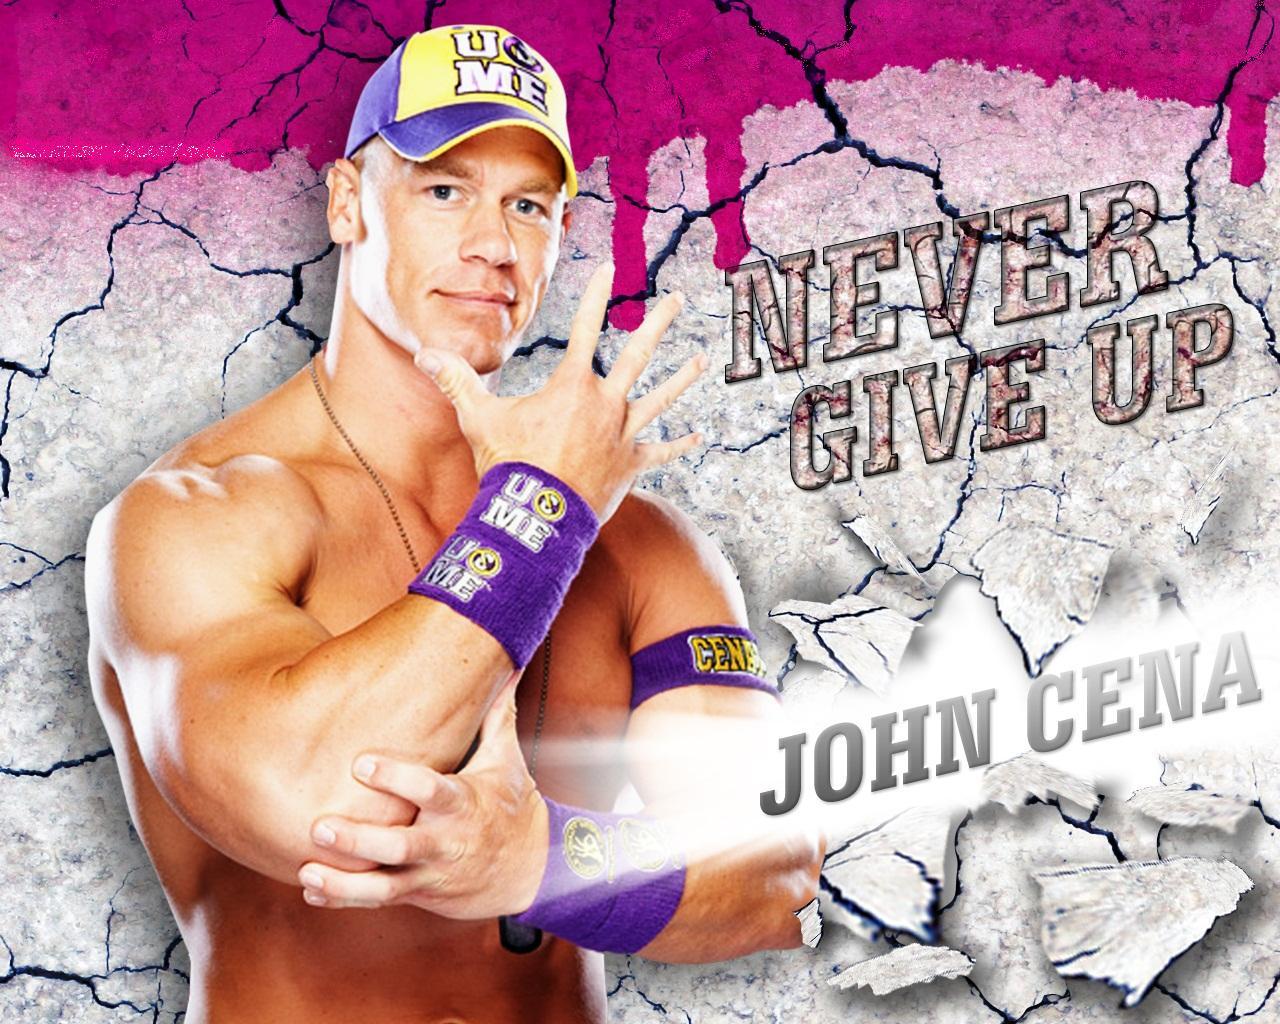 John Cena Wallpapers 2013